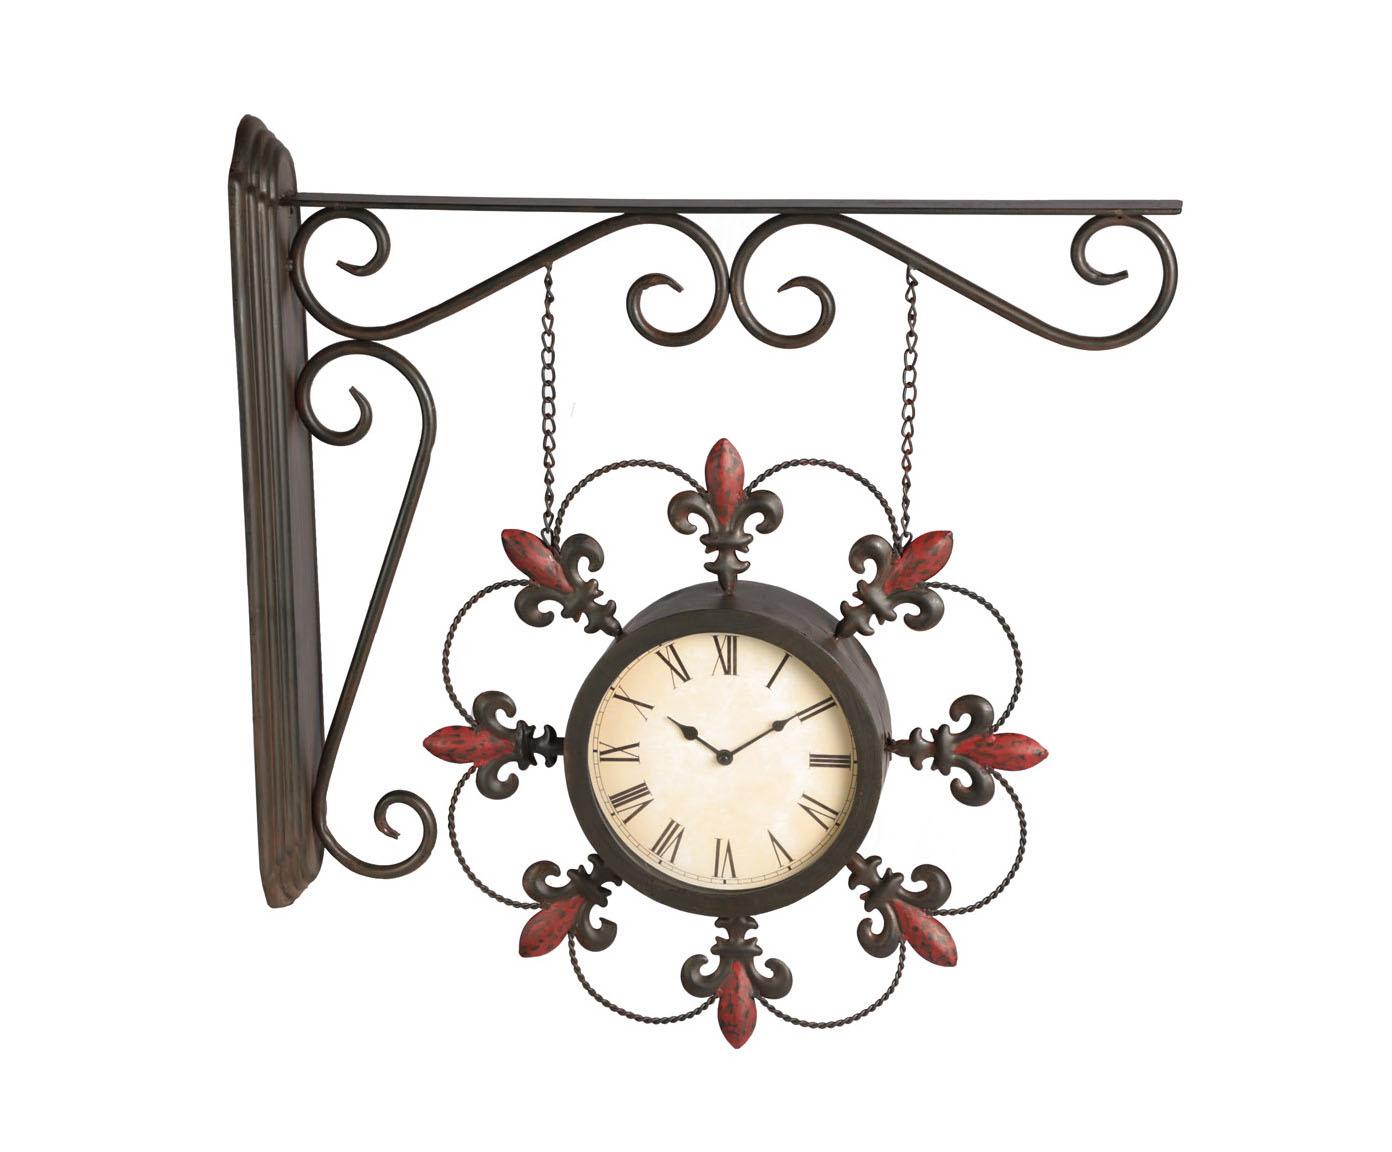 Часы настенныеНастенные часы<br>Кварцевый механизм, работают от батарейки типа АА.<br><br>Material: Металл<br>Width см: 69,5<br>Depth см: 9,5<br>Height см: 64